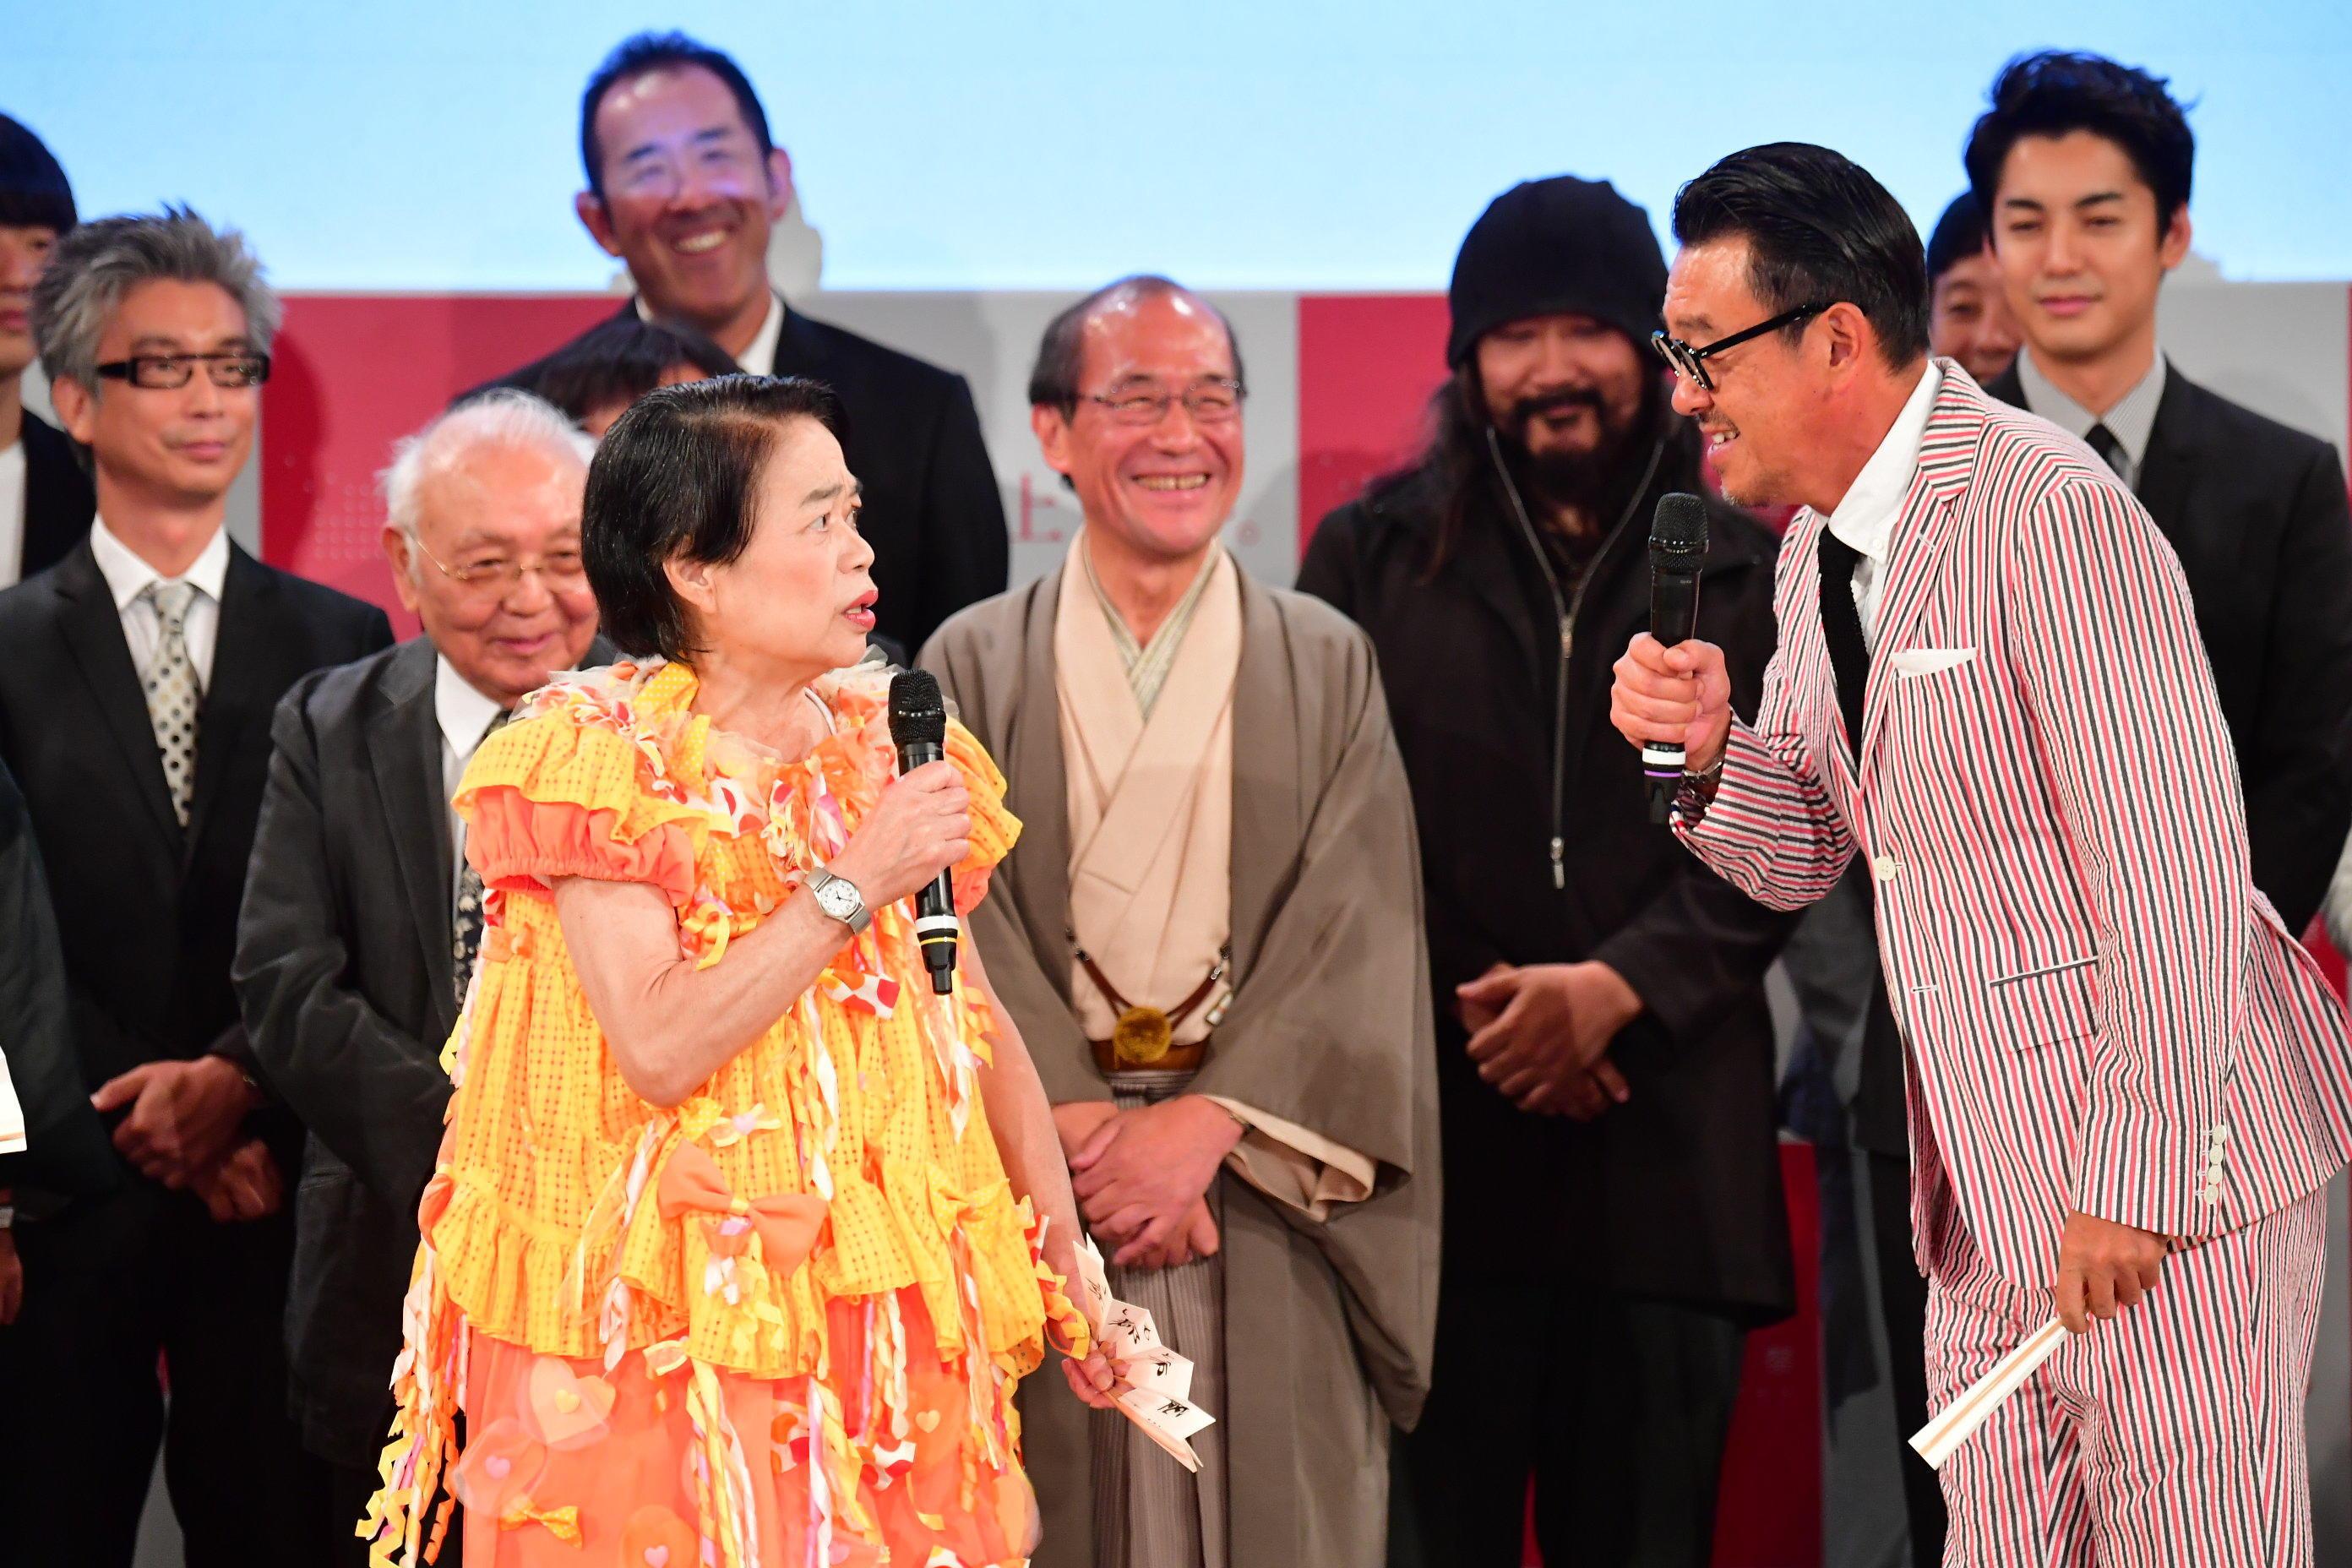 http://news.yoshimoto.co.jp/20180903234256-d1b4dac68469b81f797441f06c0edf3b47602a8c.jpg